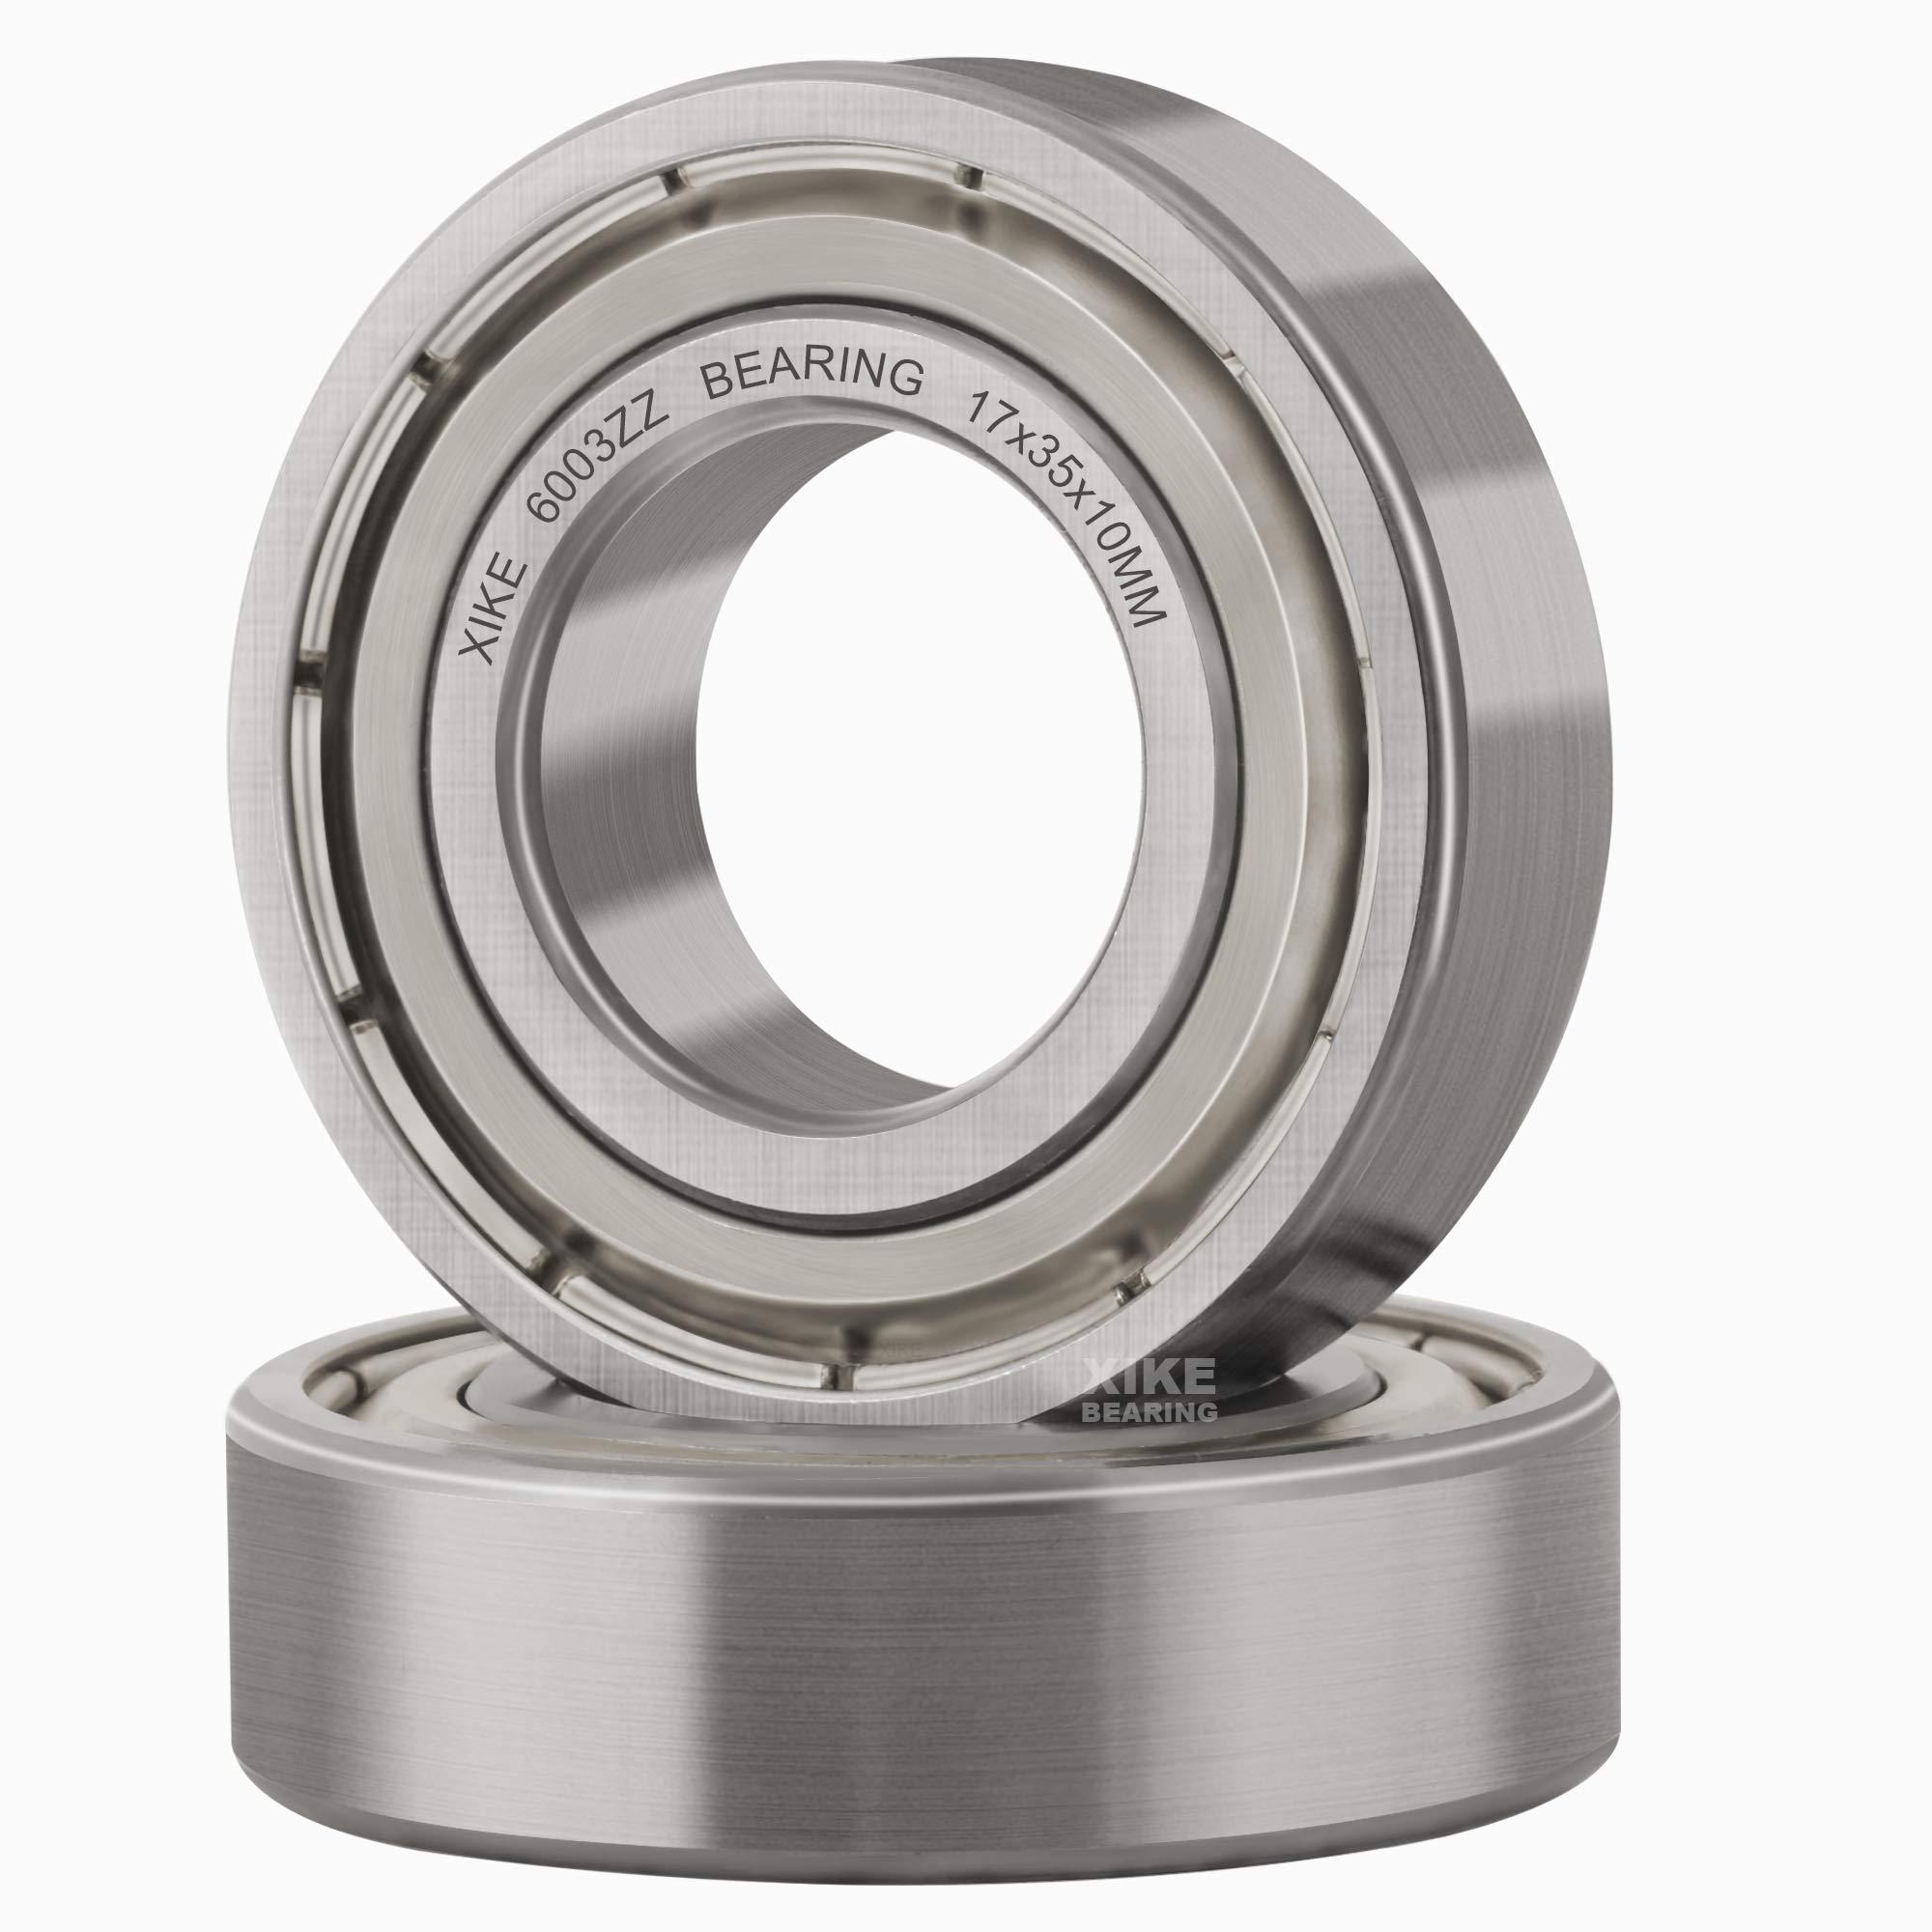 Pack of 10 ABEC 3 Electric Motor Quality C3 fit Deep Grove Ball Bearing Z2V2 6206-ZZ EMQ-Berliss